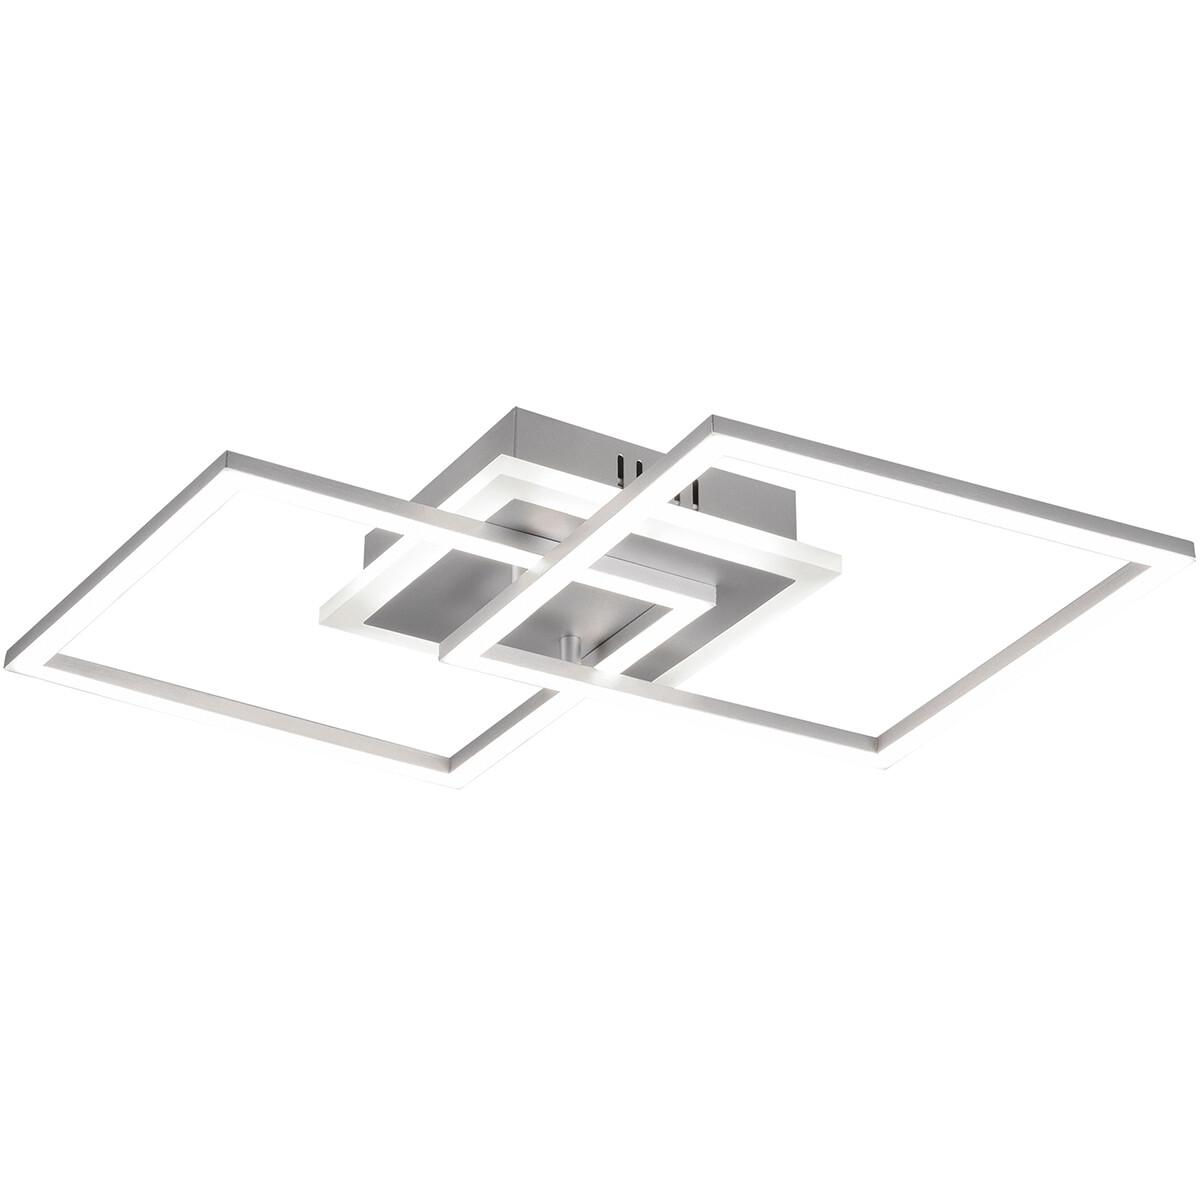 LED Plafondlamp - Plafondverlichting - Trion Venda - 25W - Warm Wit 3000K - Dimbaar - Vierkant - Mat